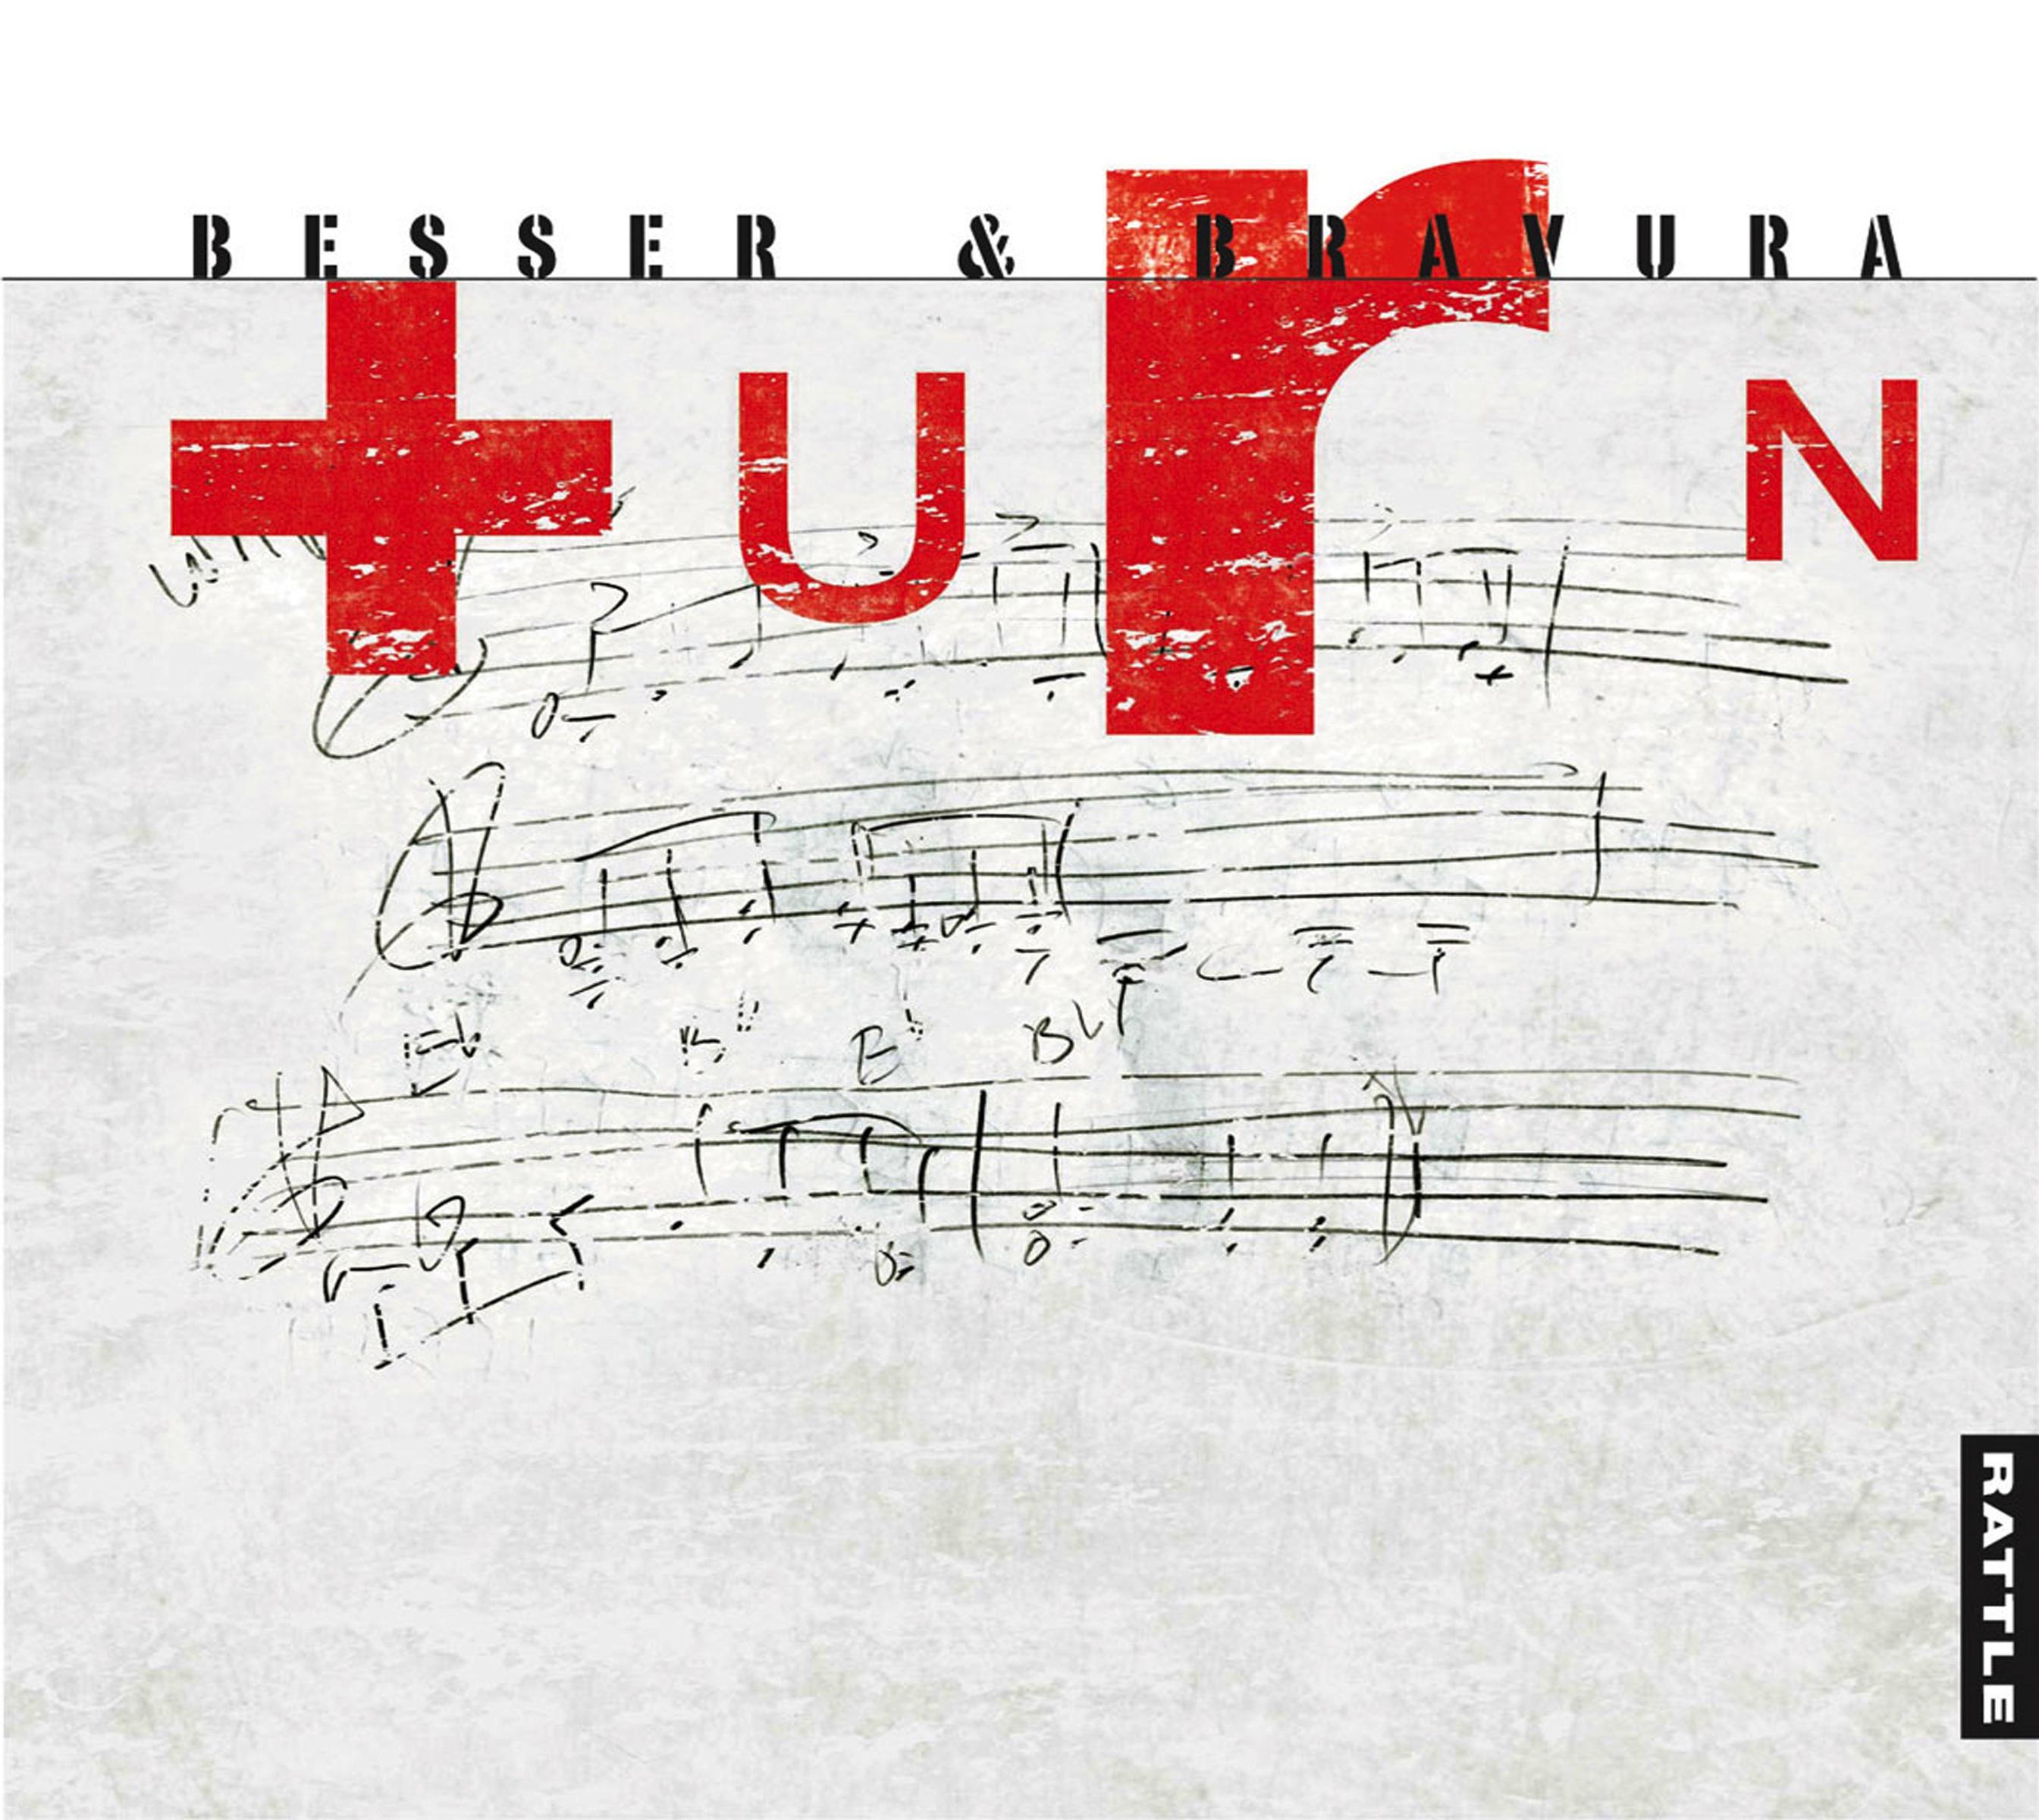 Besser & Bravura | Turn - downloadable MP3 ALBUM